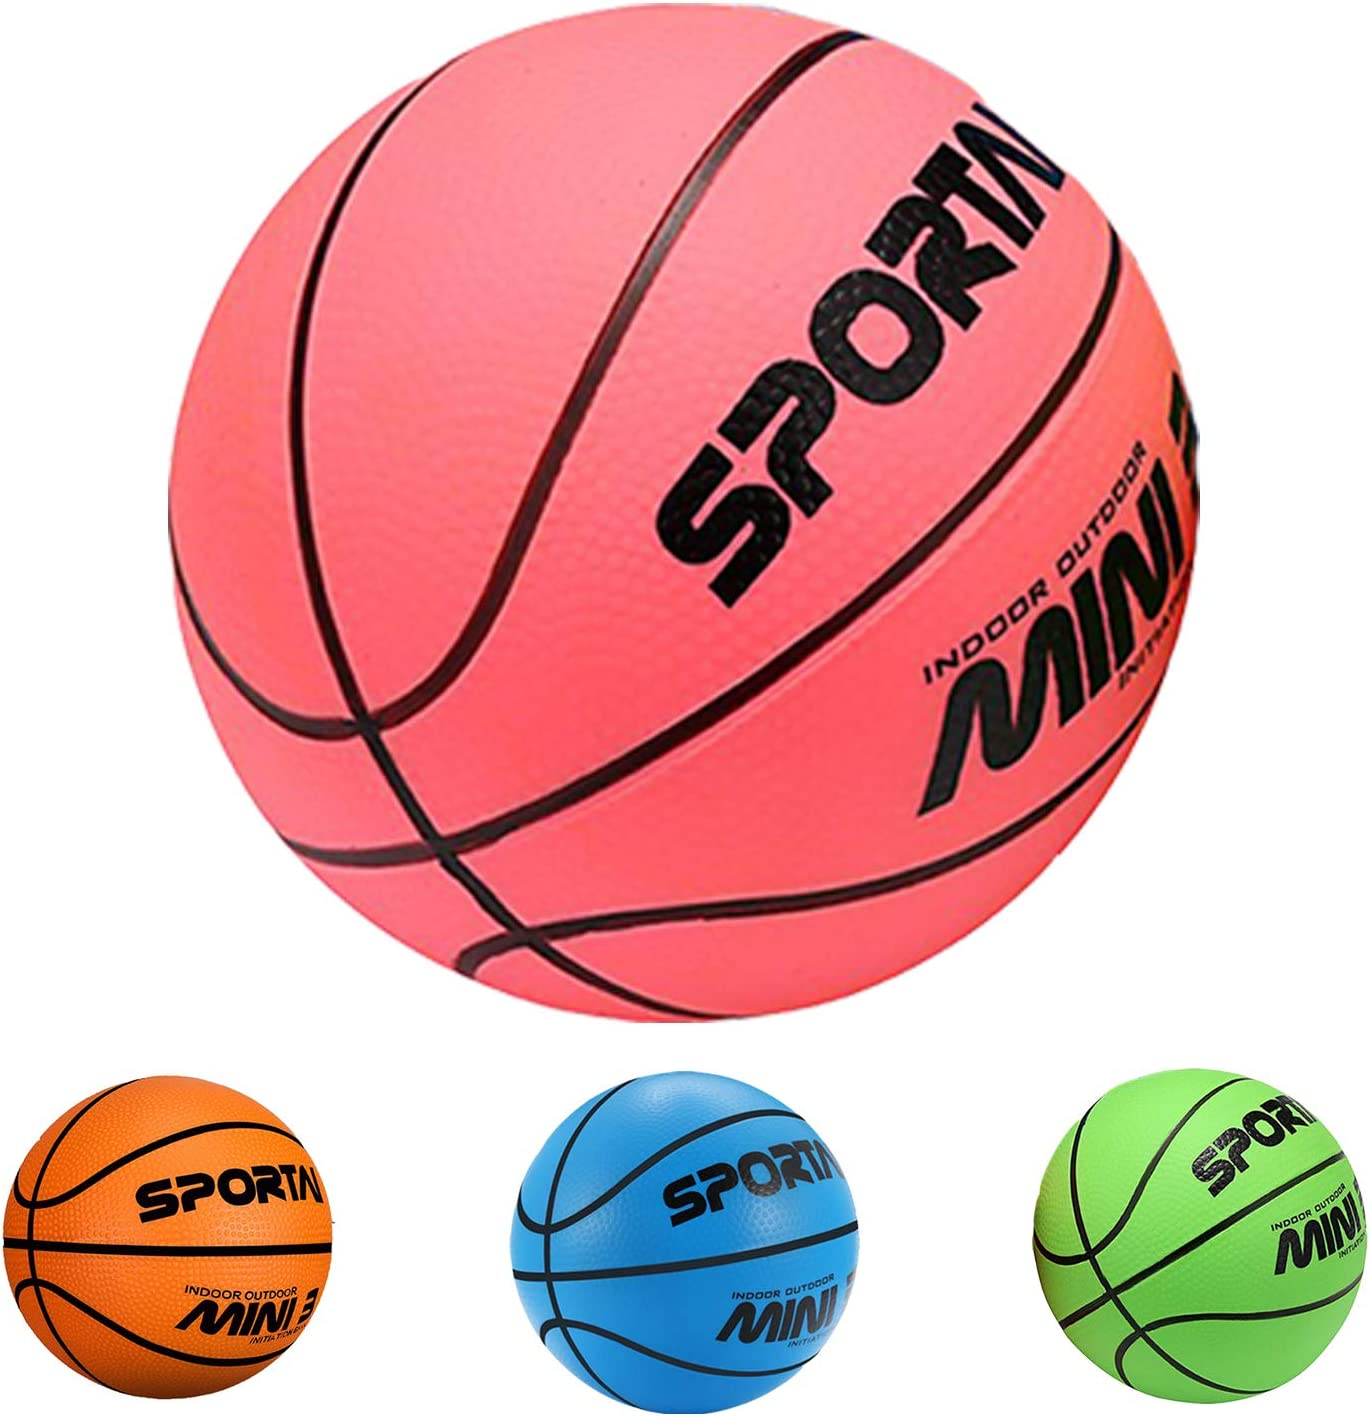 Stylife Mini Basketballs for Kids - 1 PCS Basketball - First Bas